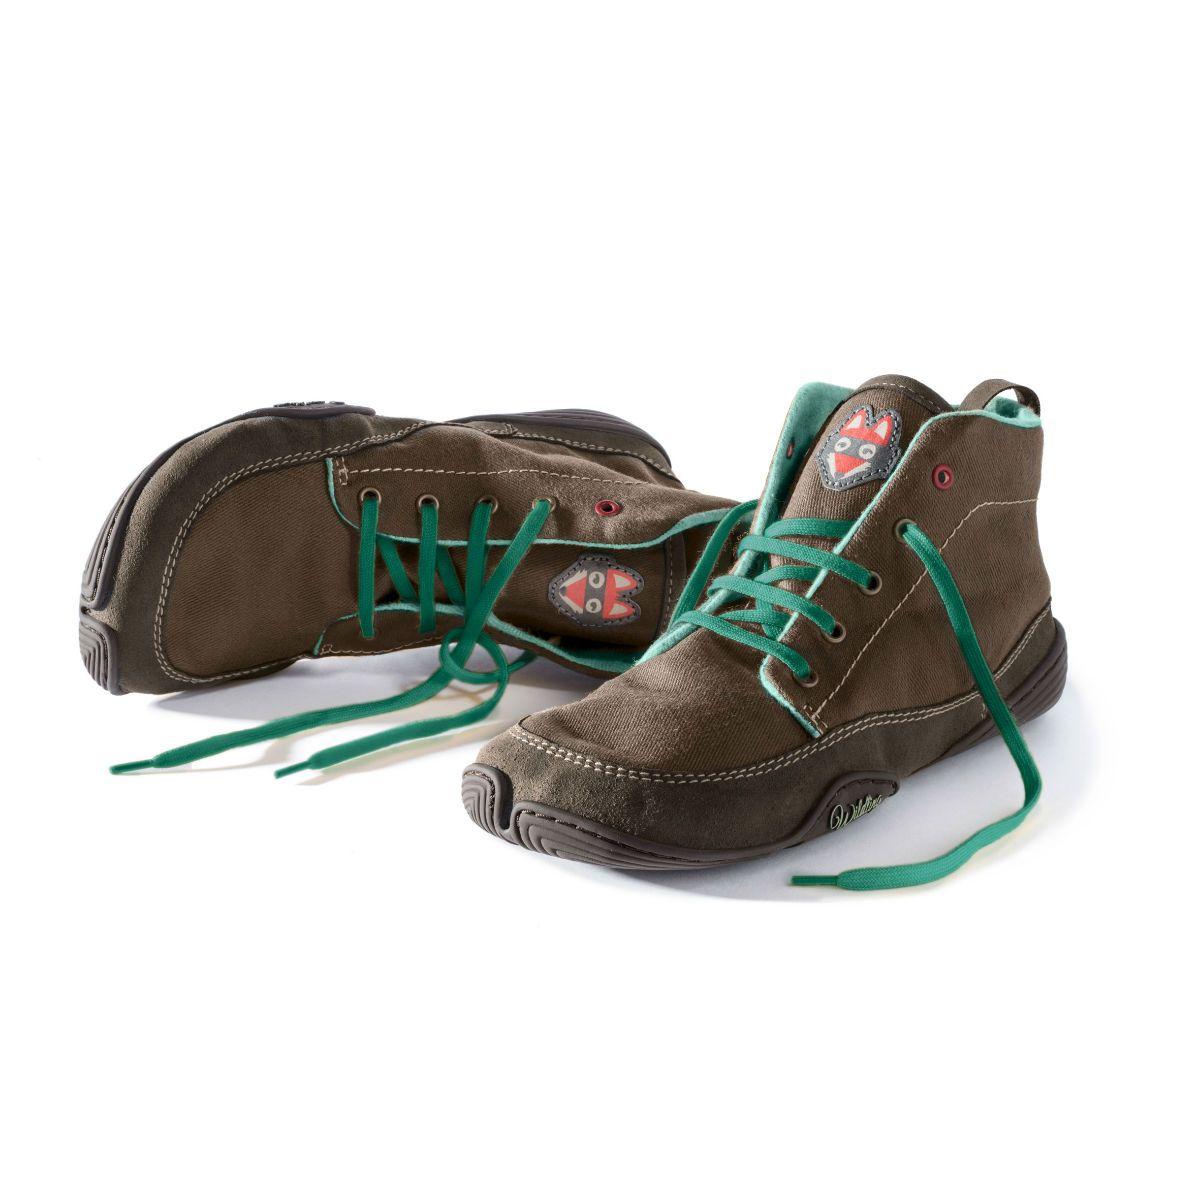 Bear - Wildling Shoes | Barefoot ShoesWildling Shoes | Barefoot Shoes